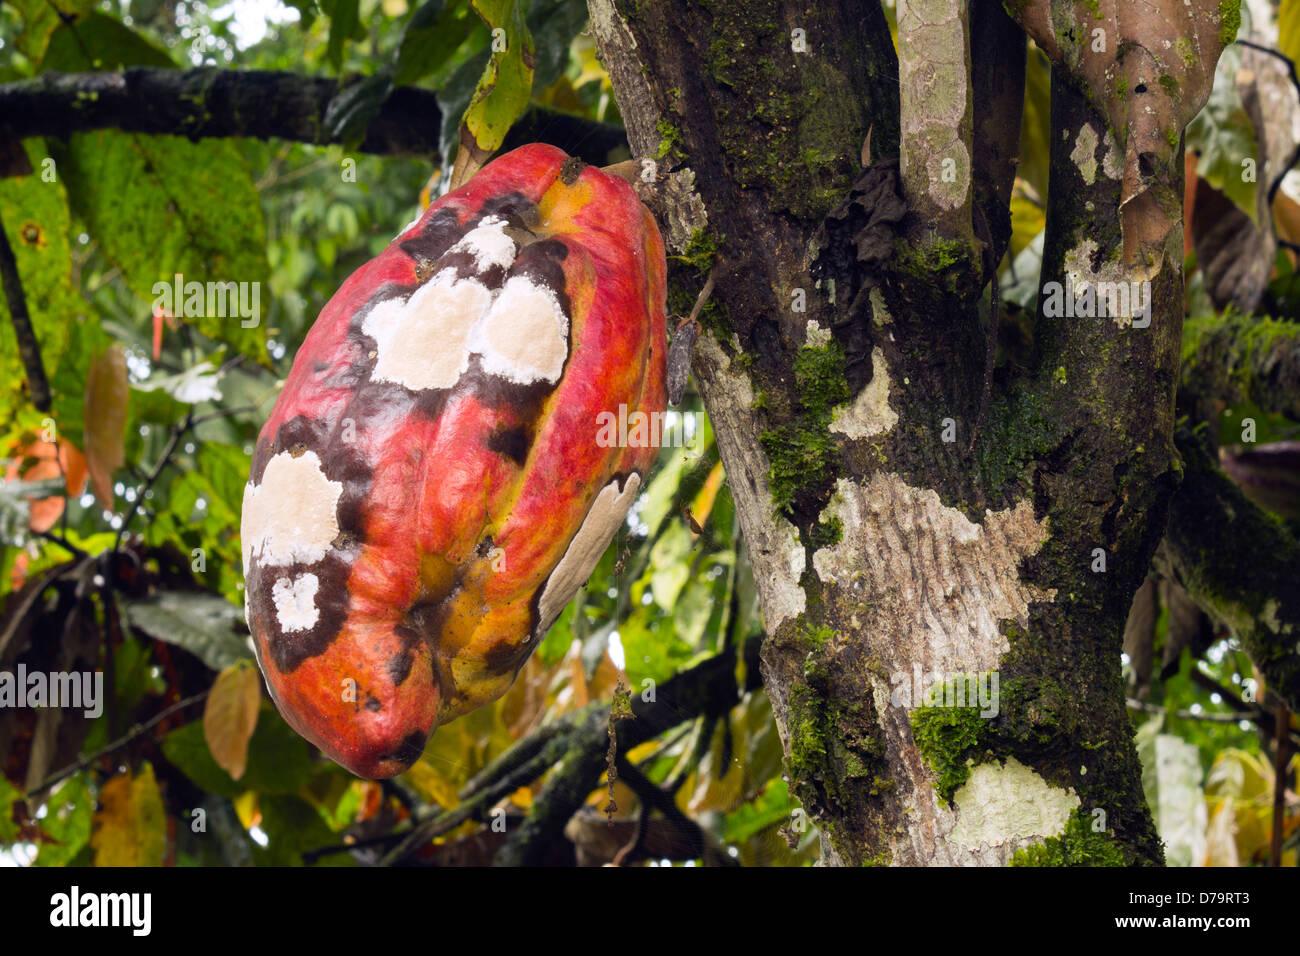 Kakaofrucht mit Frosty Pod Krankheit infiziert verursacht durch den Pilz Basidiomycete Moniliophthora Roreri, Ecuador Stockbild